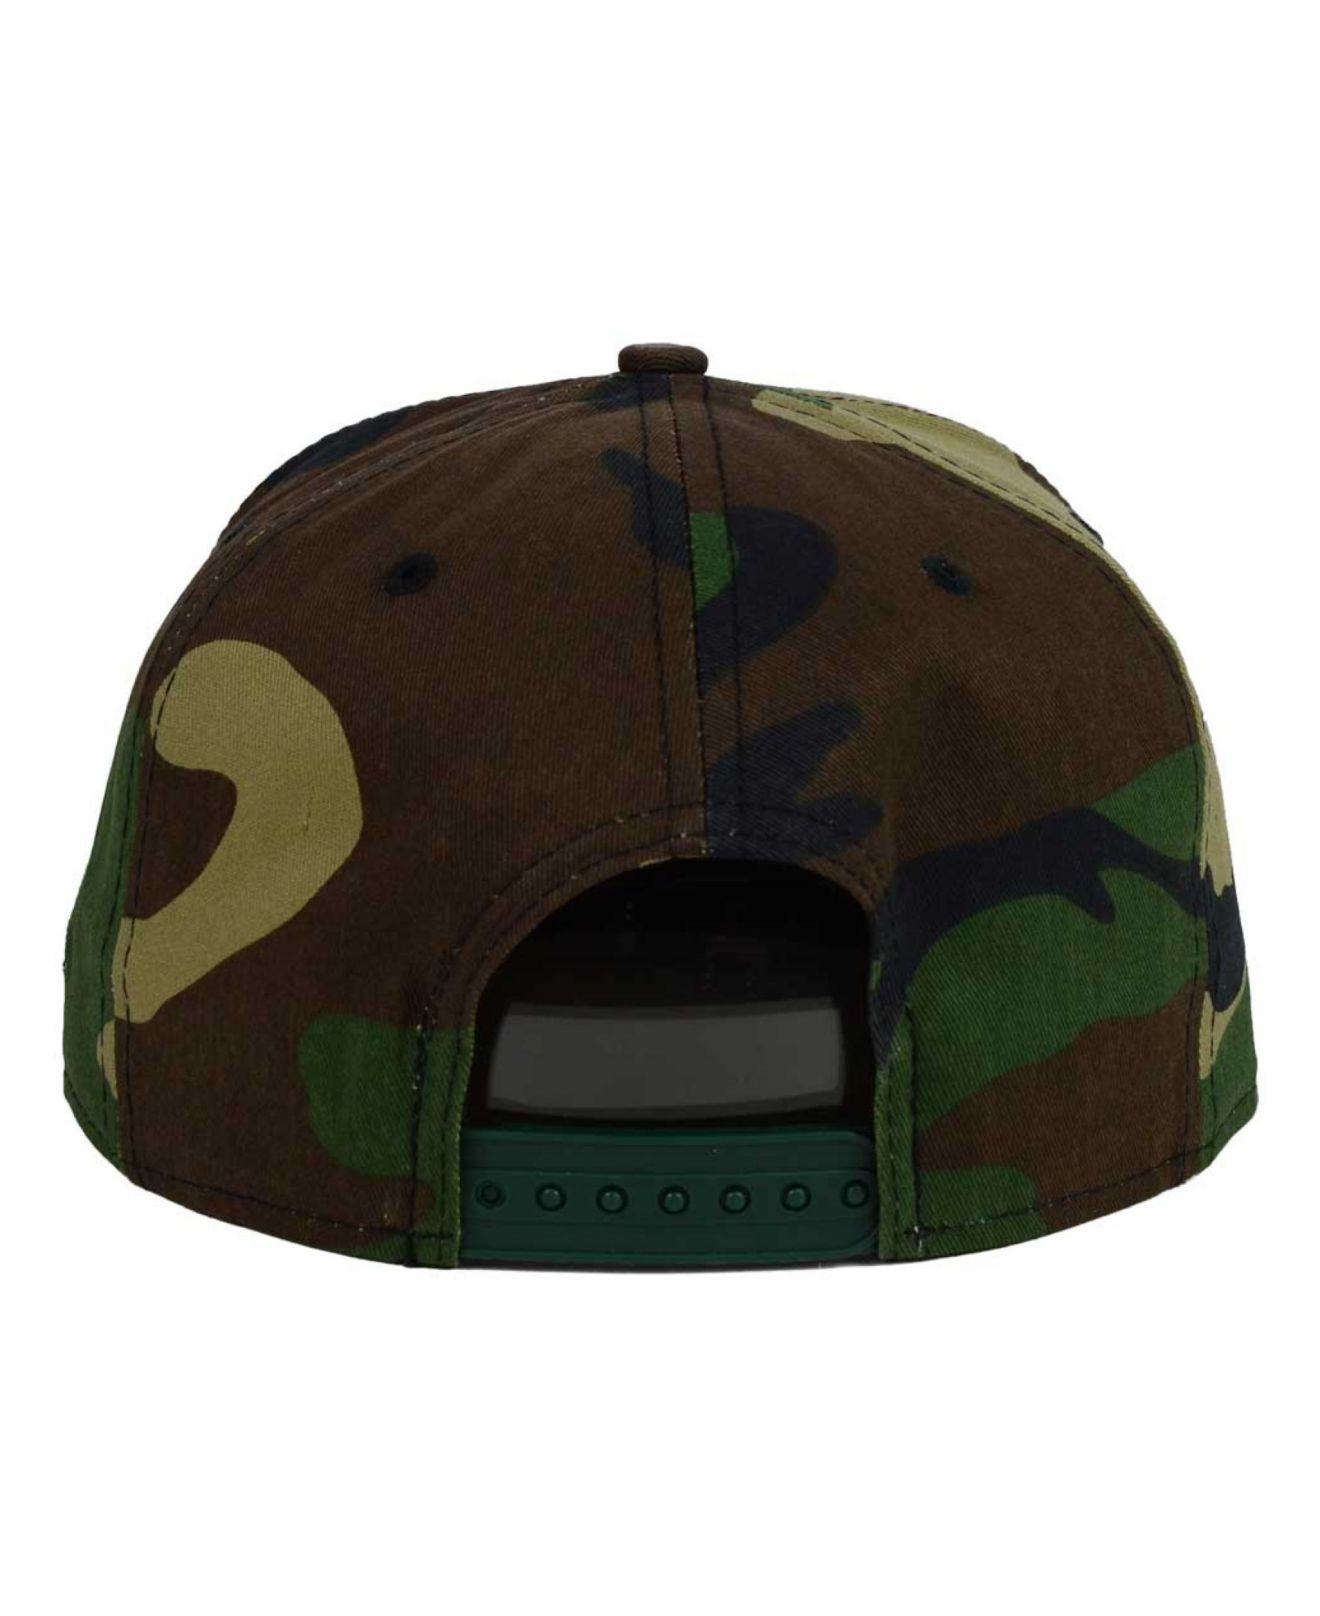 996f8582f5beb sweden green bay packers camo bucket hat 2c4d4 7948a